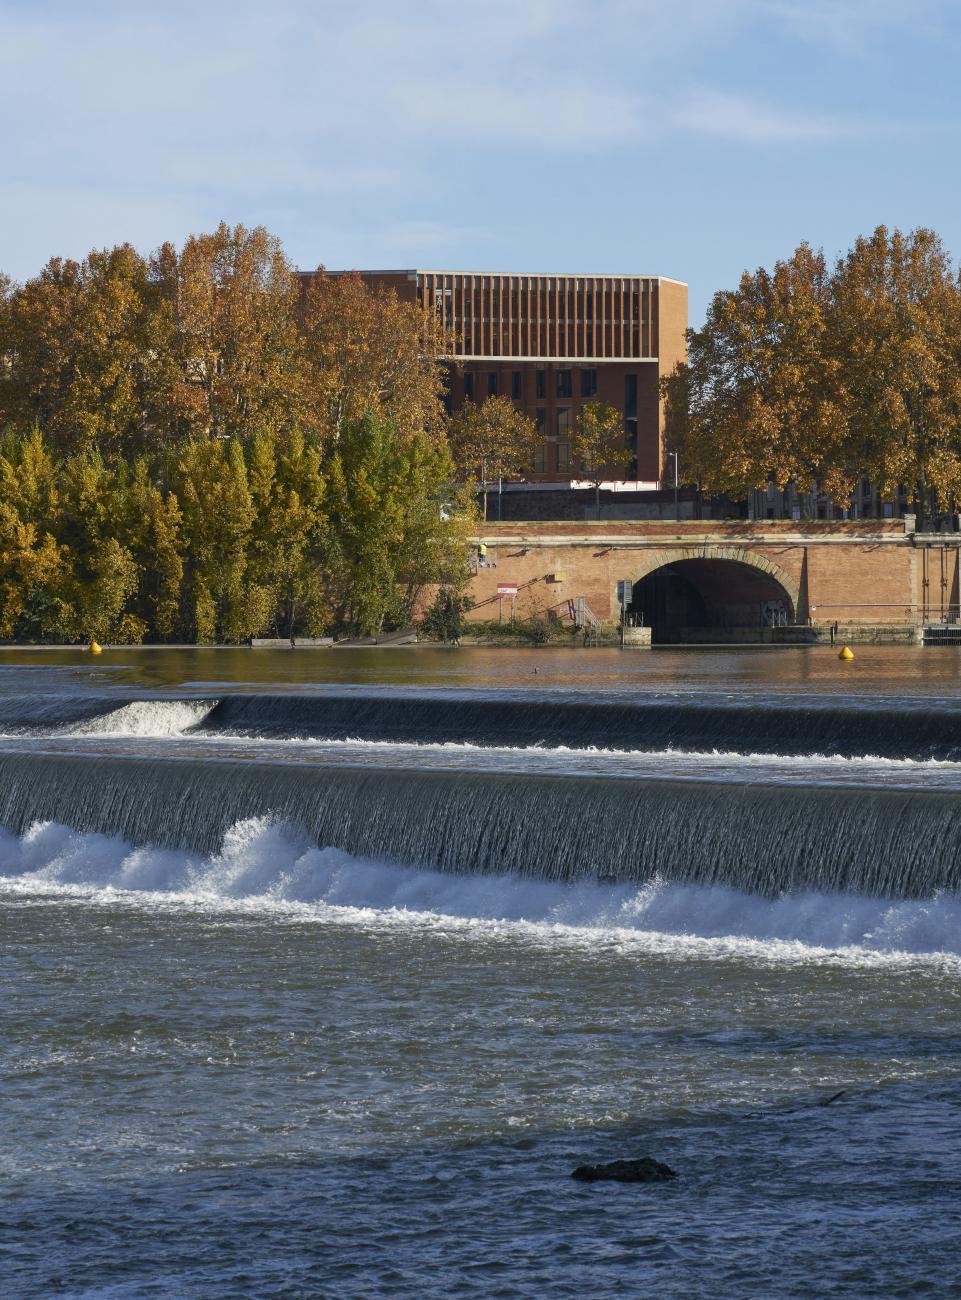 Université Toulouse 1 Capitole, School of Economics by Grafton Architects - Photo courtesy of Dennis Gilbert.